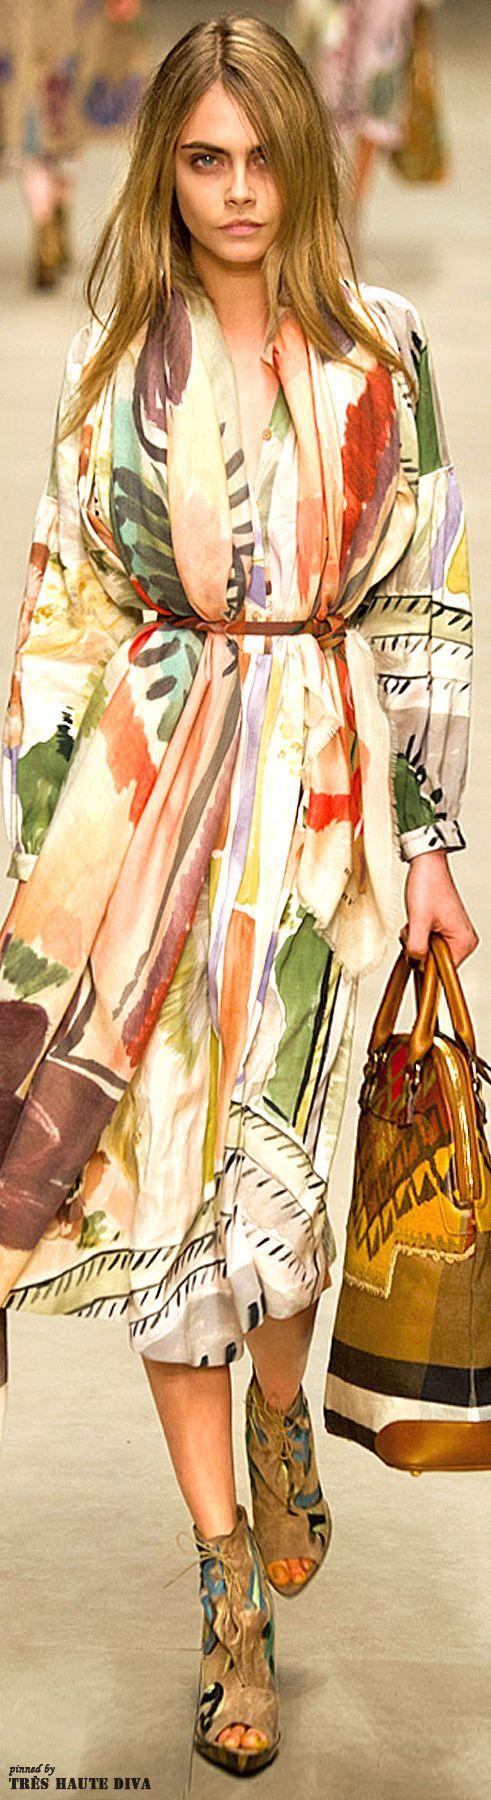 Burberry Prorsum F/W 2014 - London Fashion Week  Love the scarf look